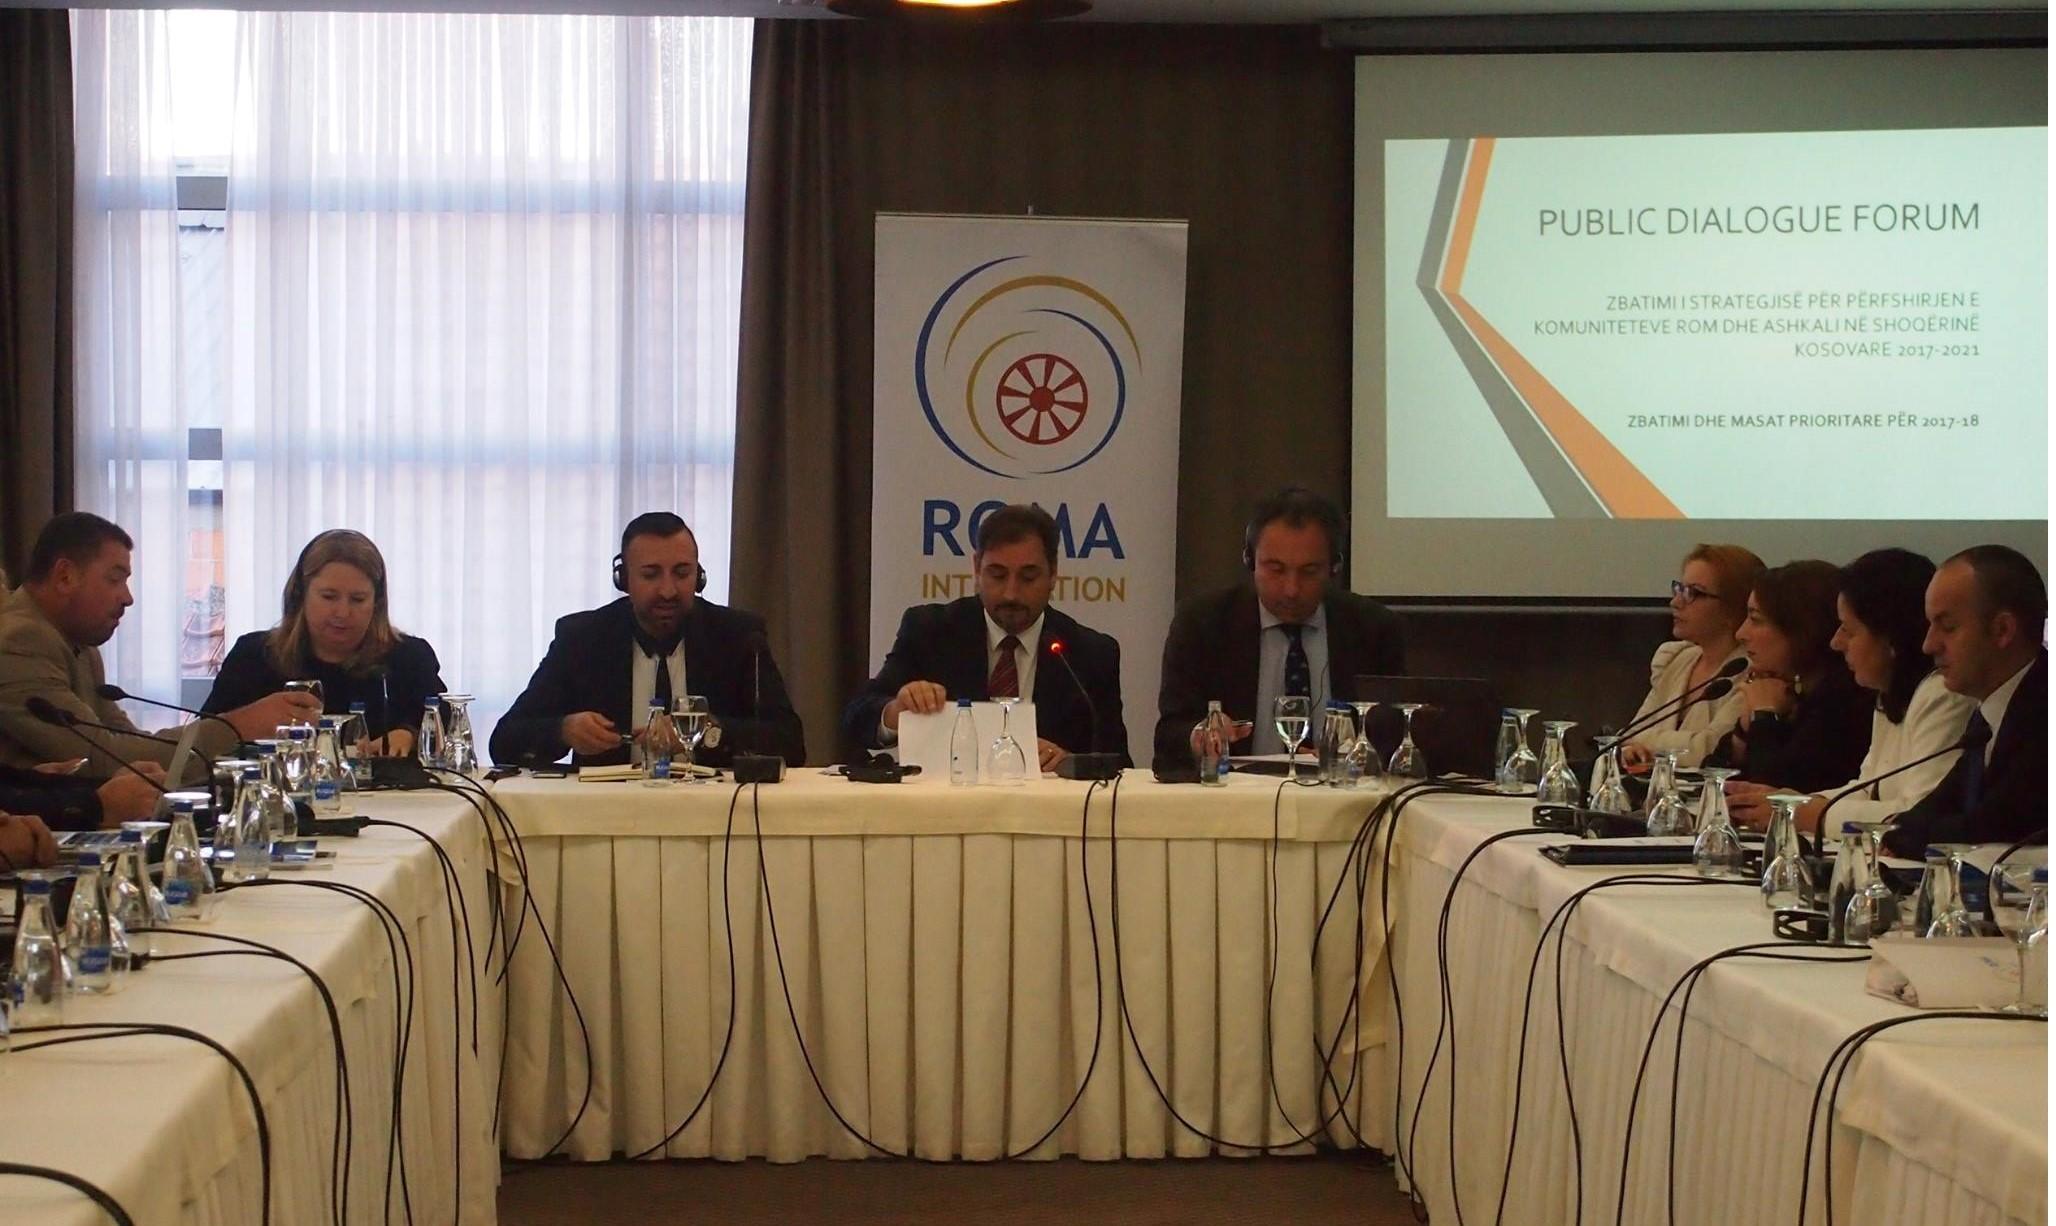 Roma Integration 2020, Public Dialogue Forum, Prishtina, 17 October 2017 (Photo: RI2020/Rada Krstanovic)